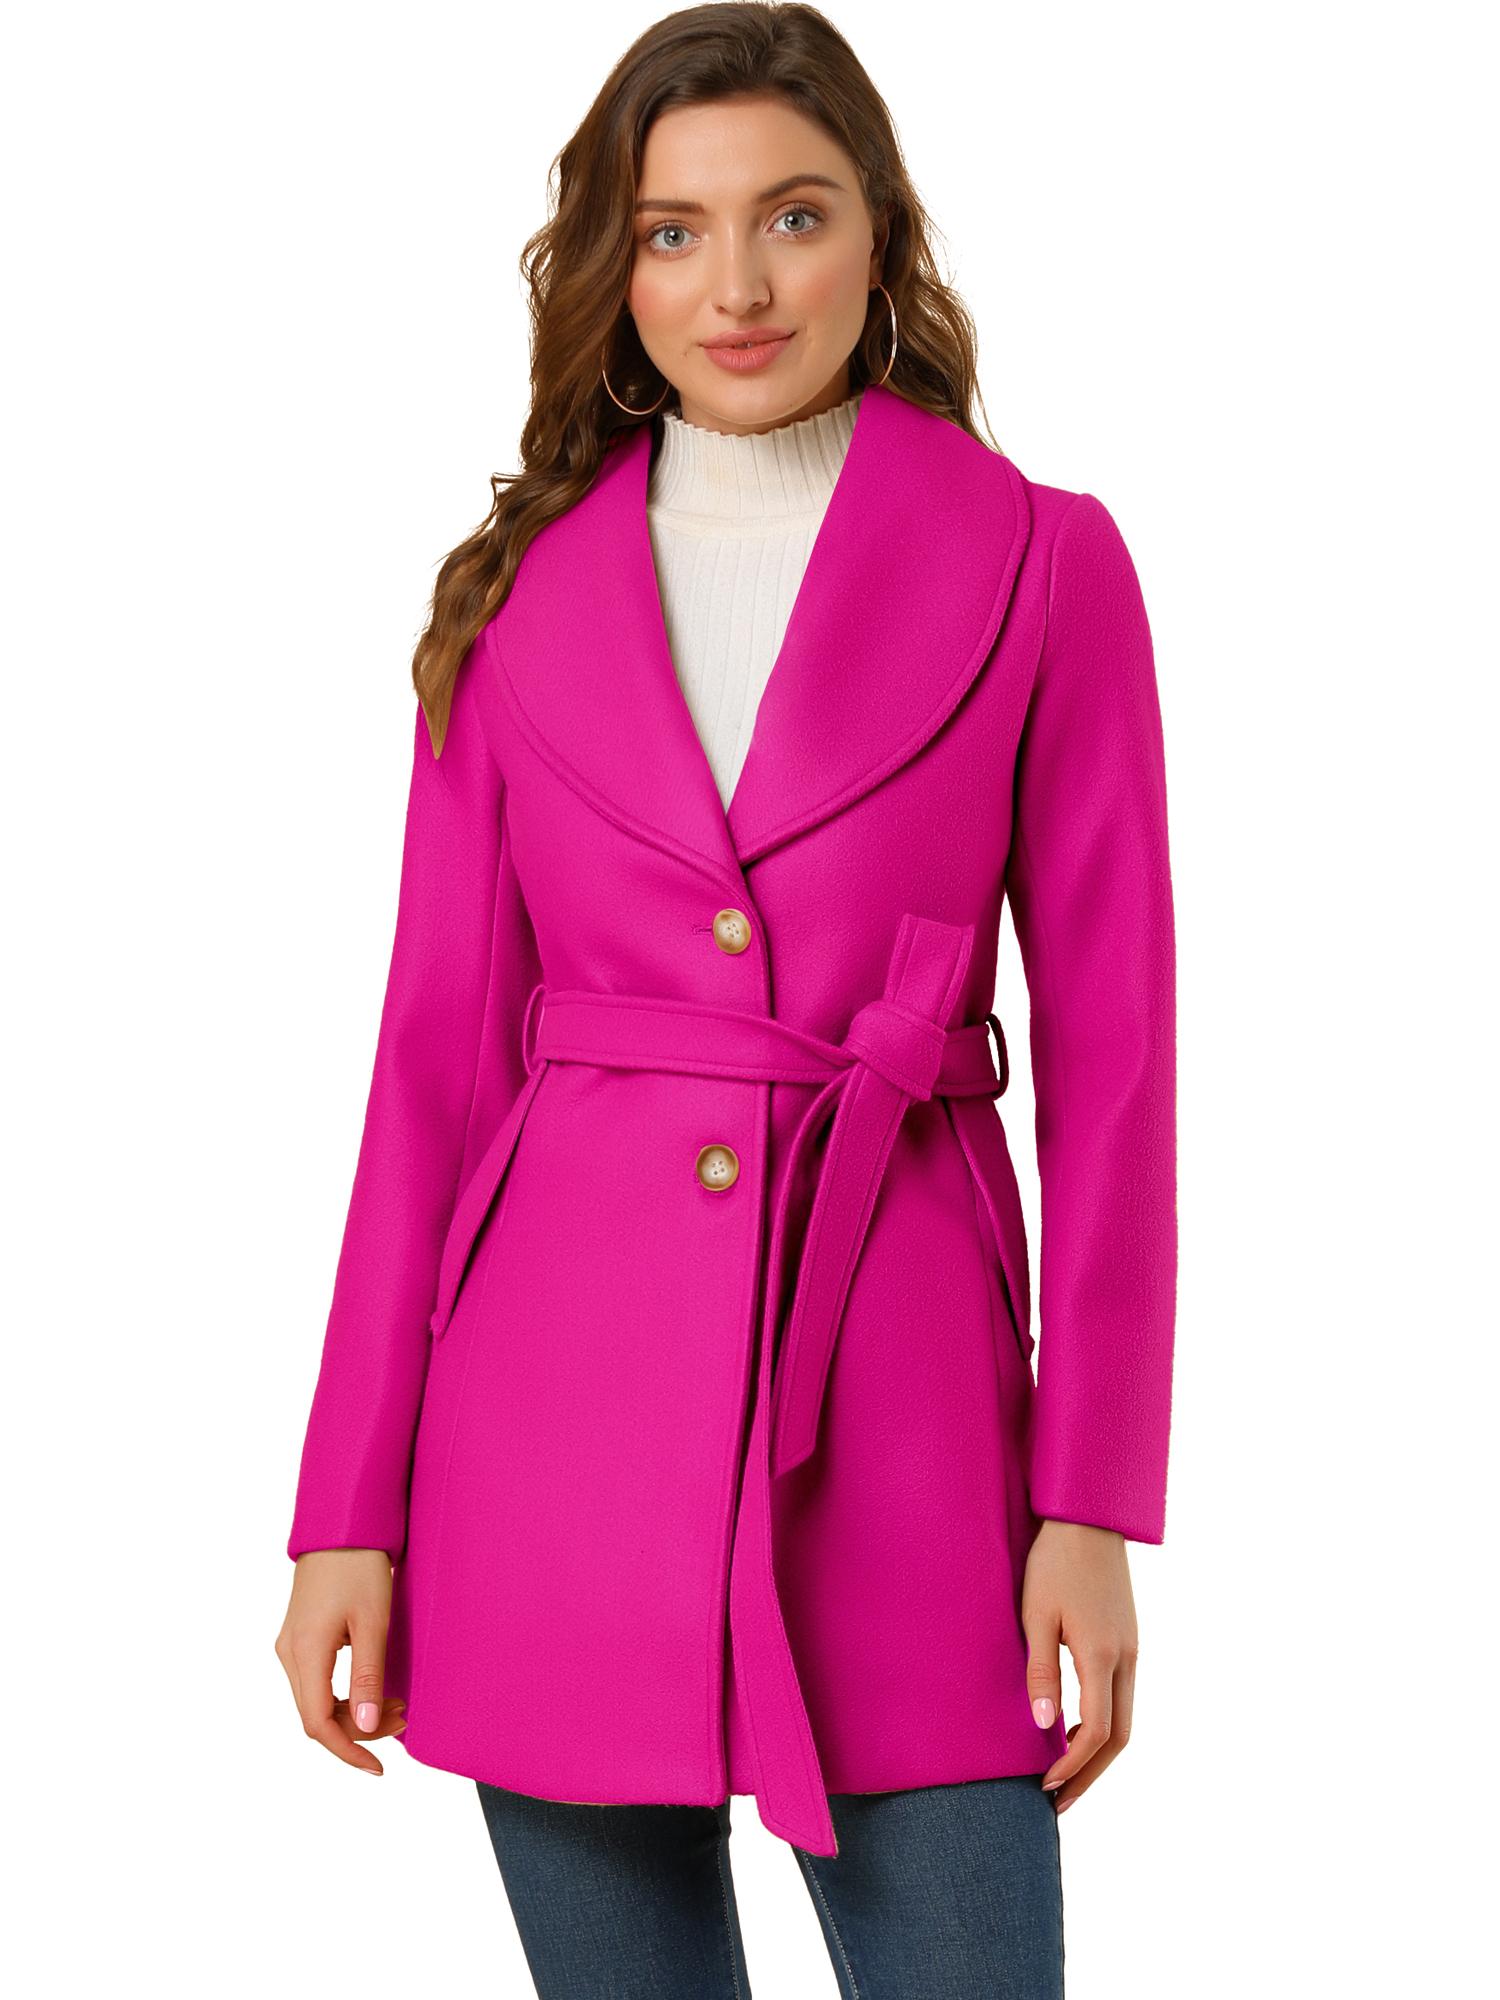 Allegra K Women's Casual Cute Slim Single Breasted Belt Coat Rose Red M (US 10)